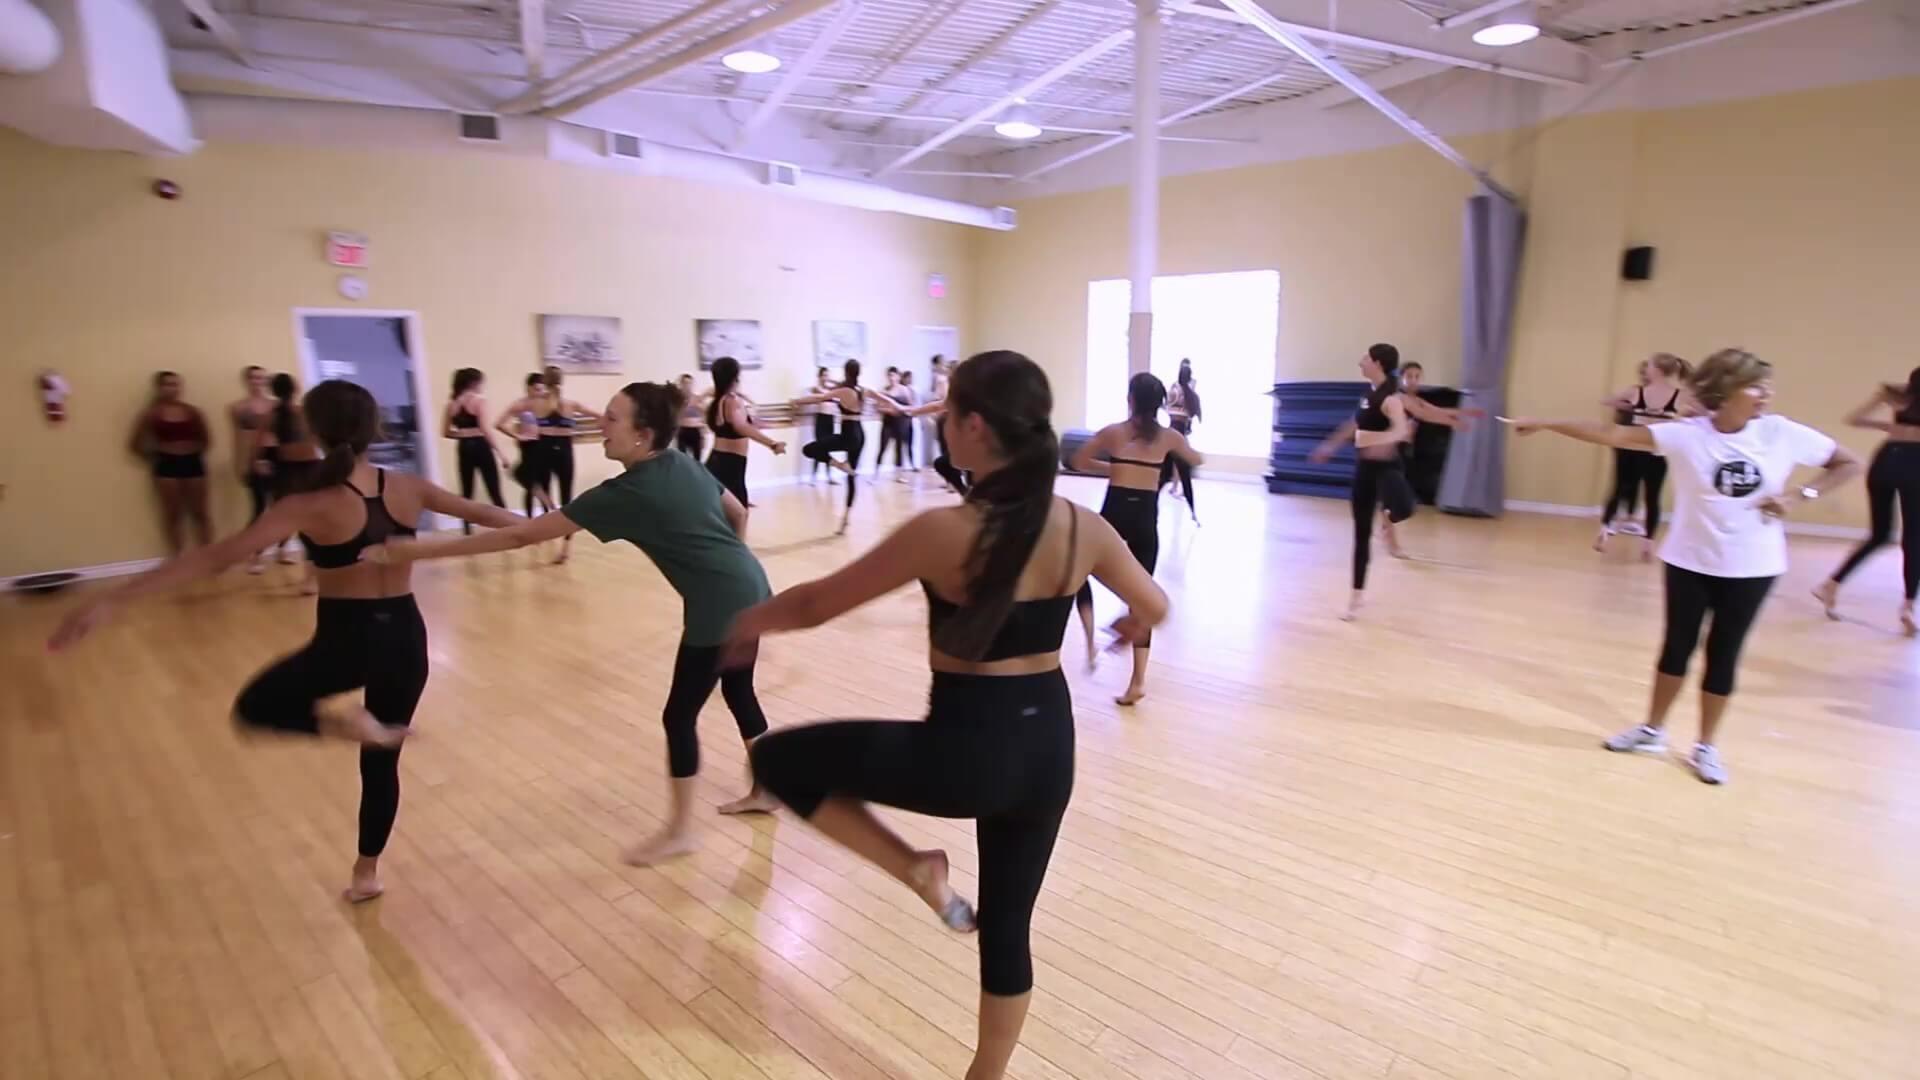 ballet dancers doing turns